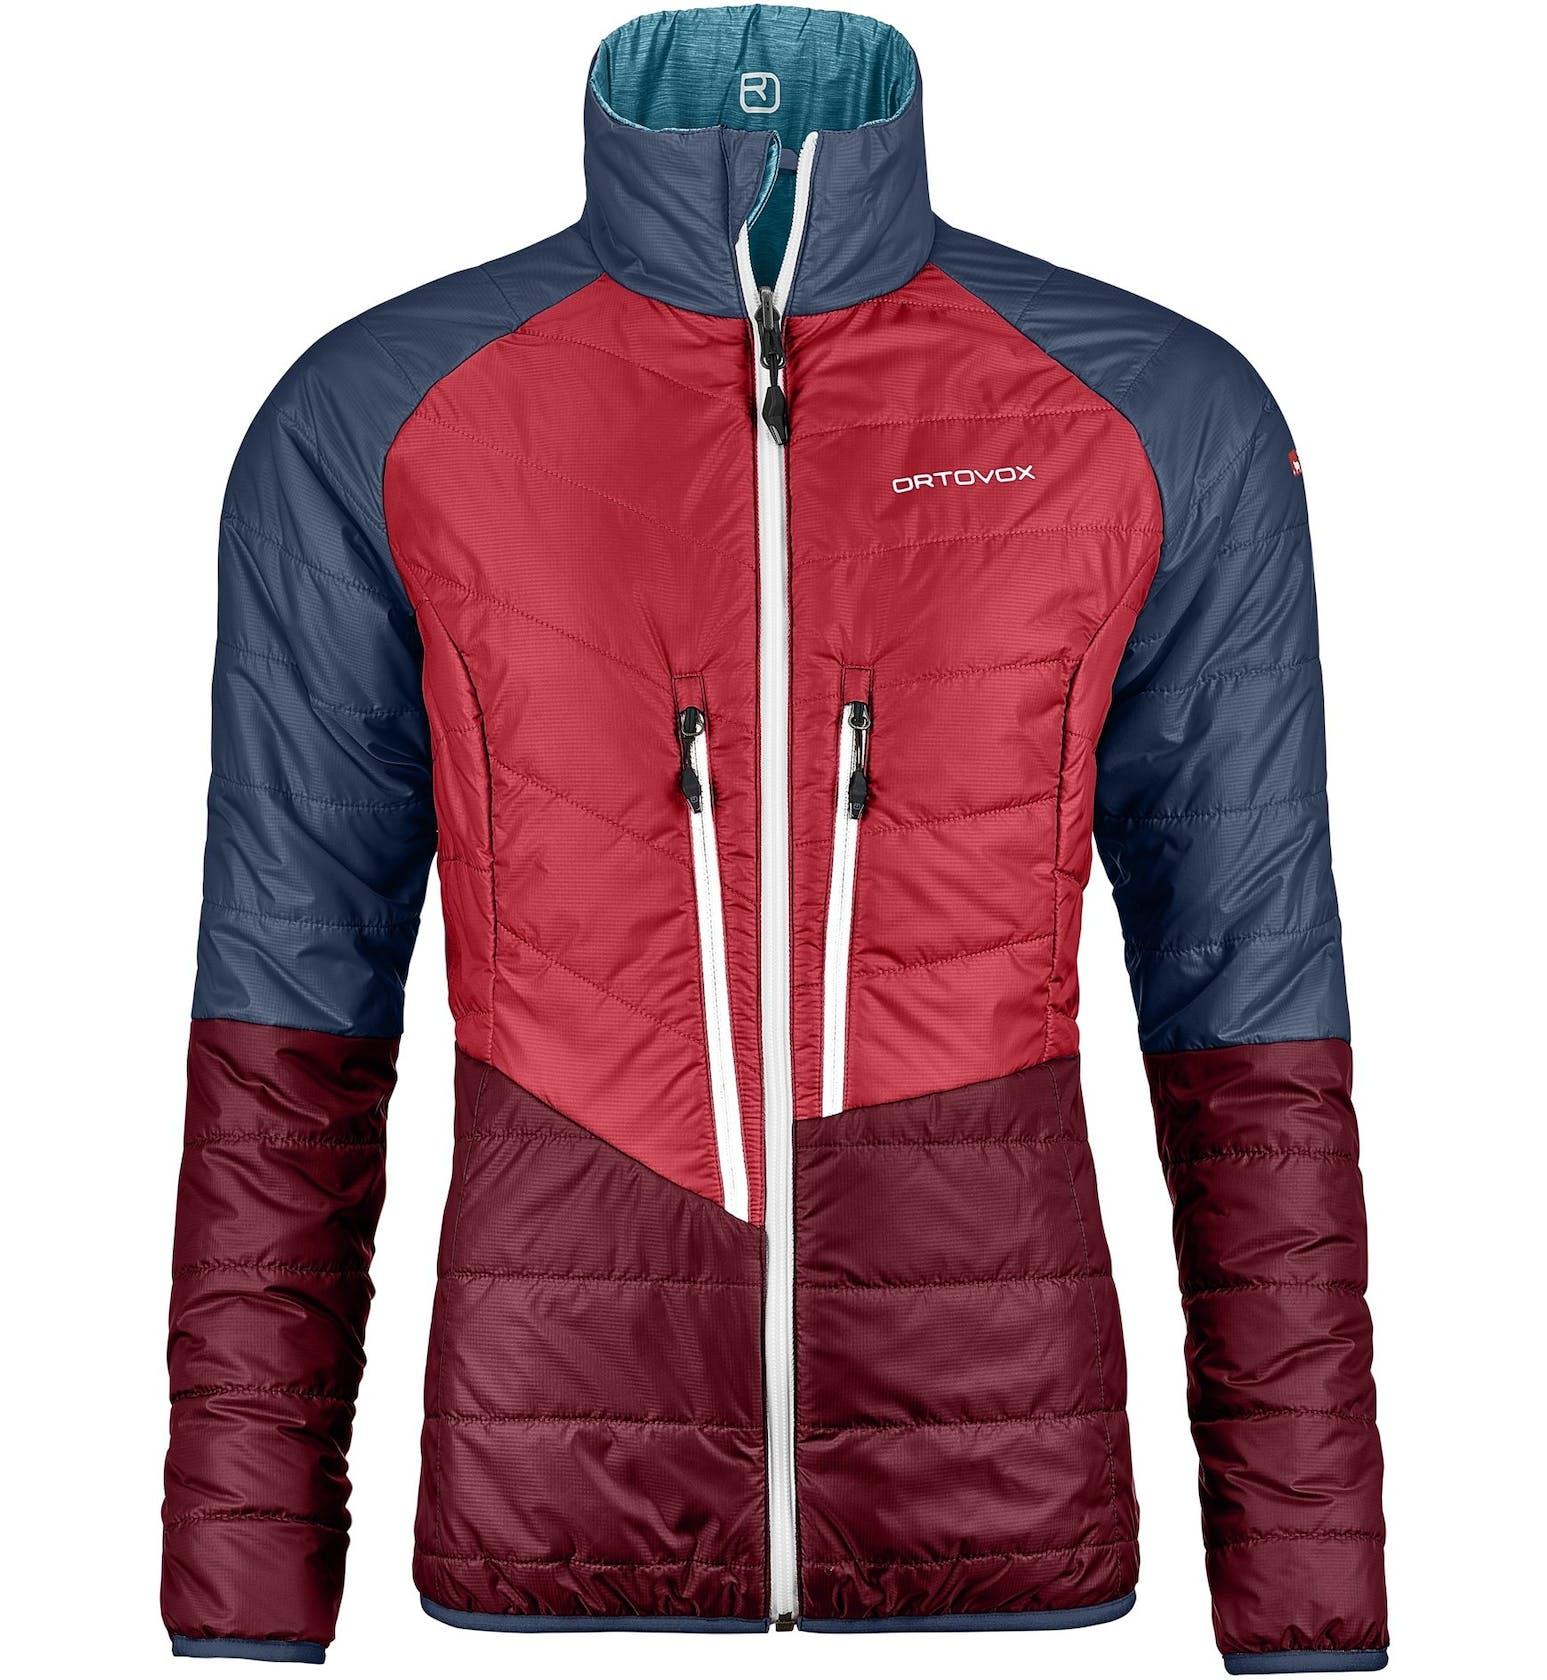 Ortovox Piz Bial - giacca sci alpinismo - donna